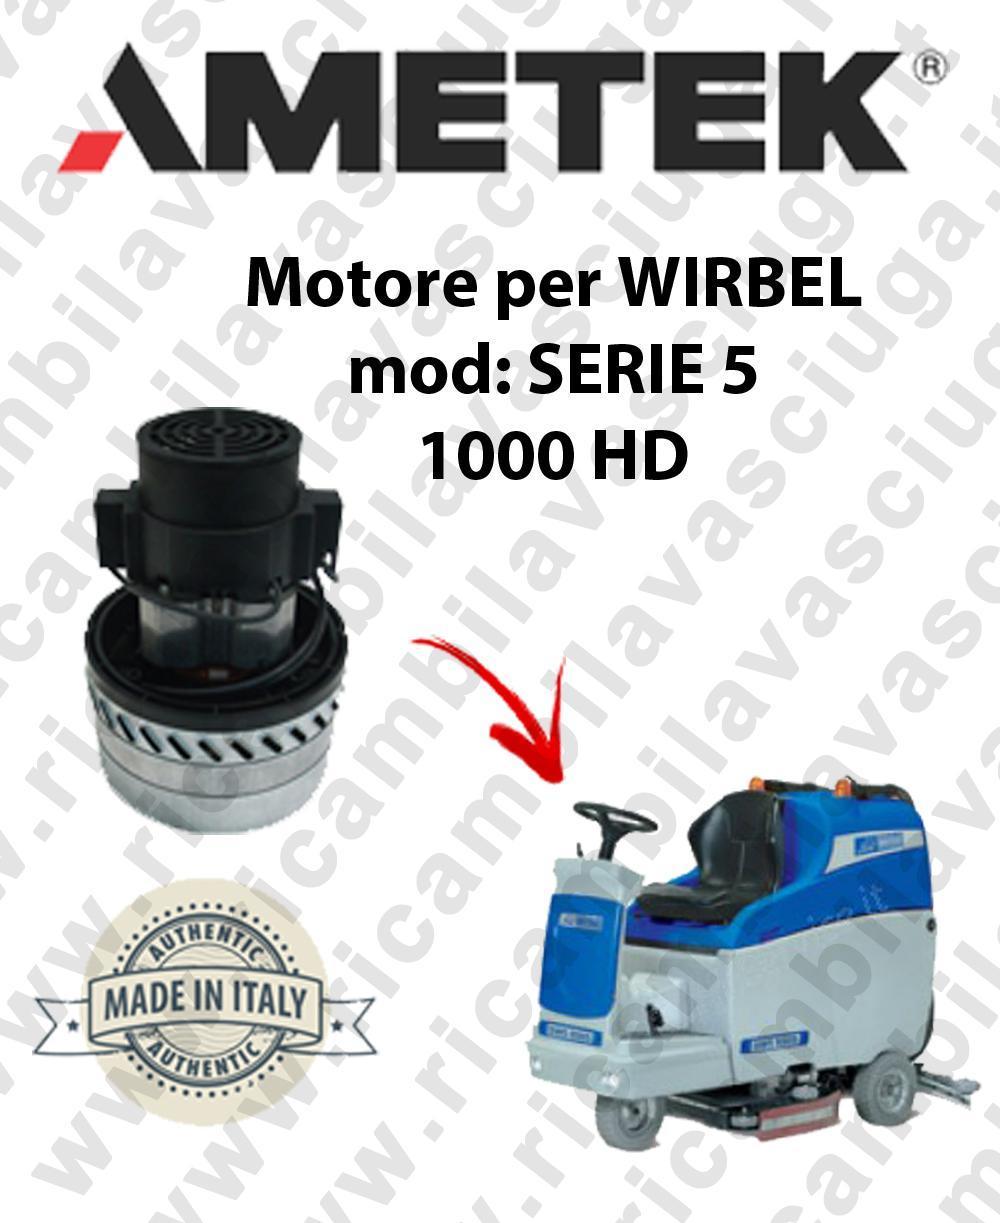 SERIE 5 1000 HD Motore de aspiración AMETEK para fregadora WIRBEL